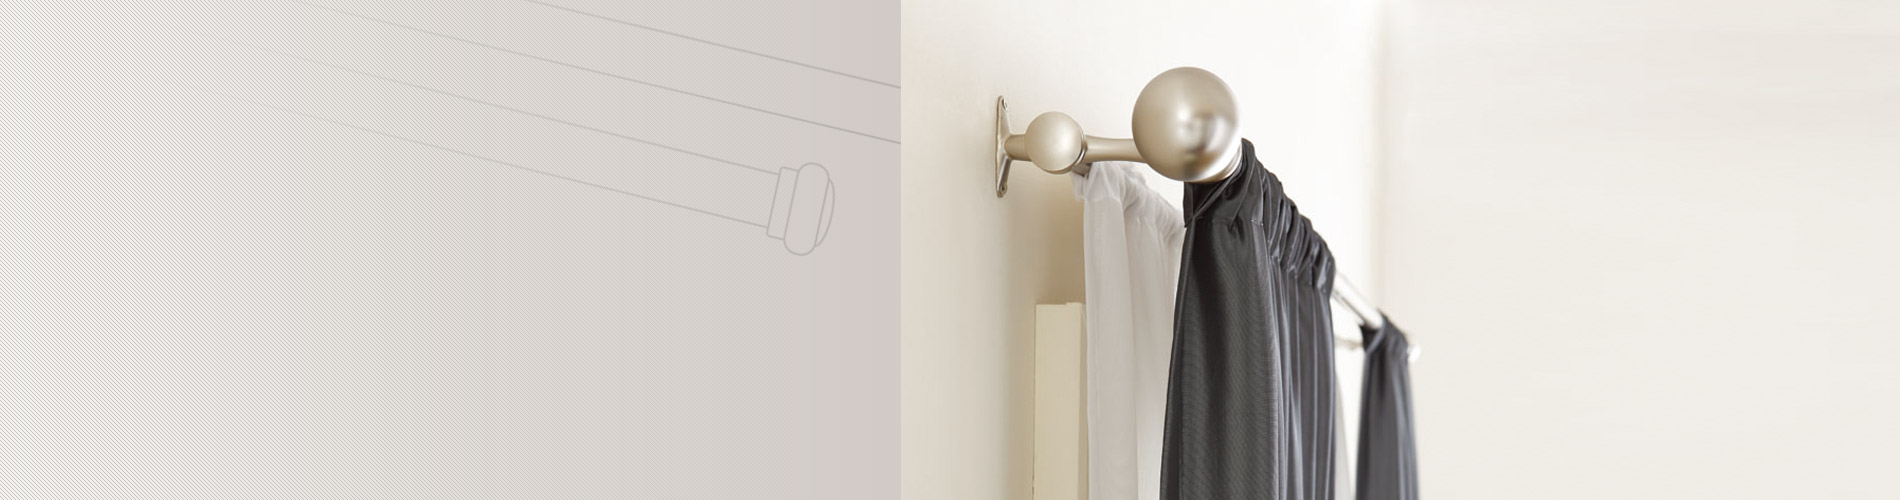 Batang Tirai selalu ditempel di dinding dengan finial dan braket dekoratif. Ini dapat beroperasi sebagai batang teleskopik, batang tunggal, batang ganda dan batang lengan ayun.